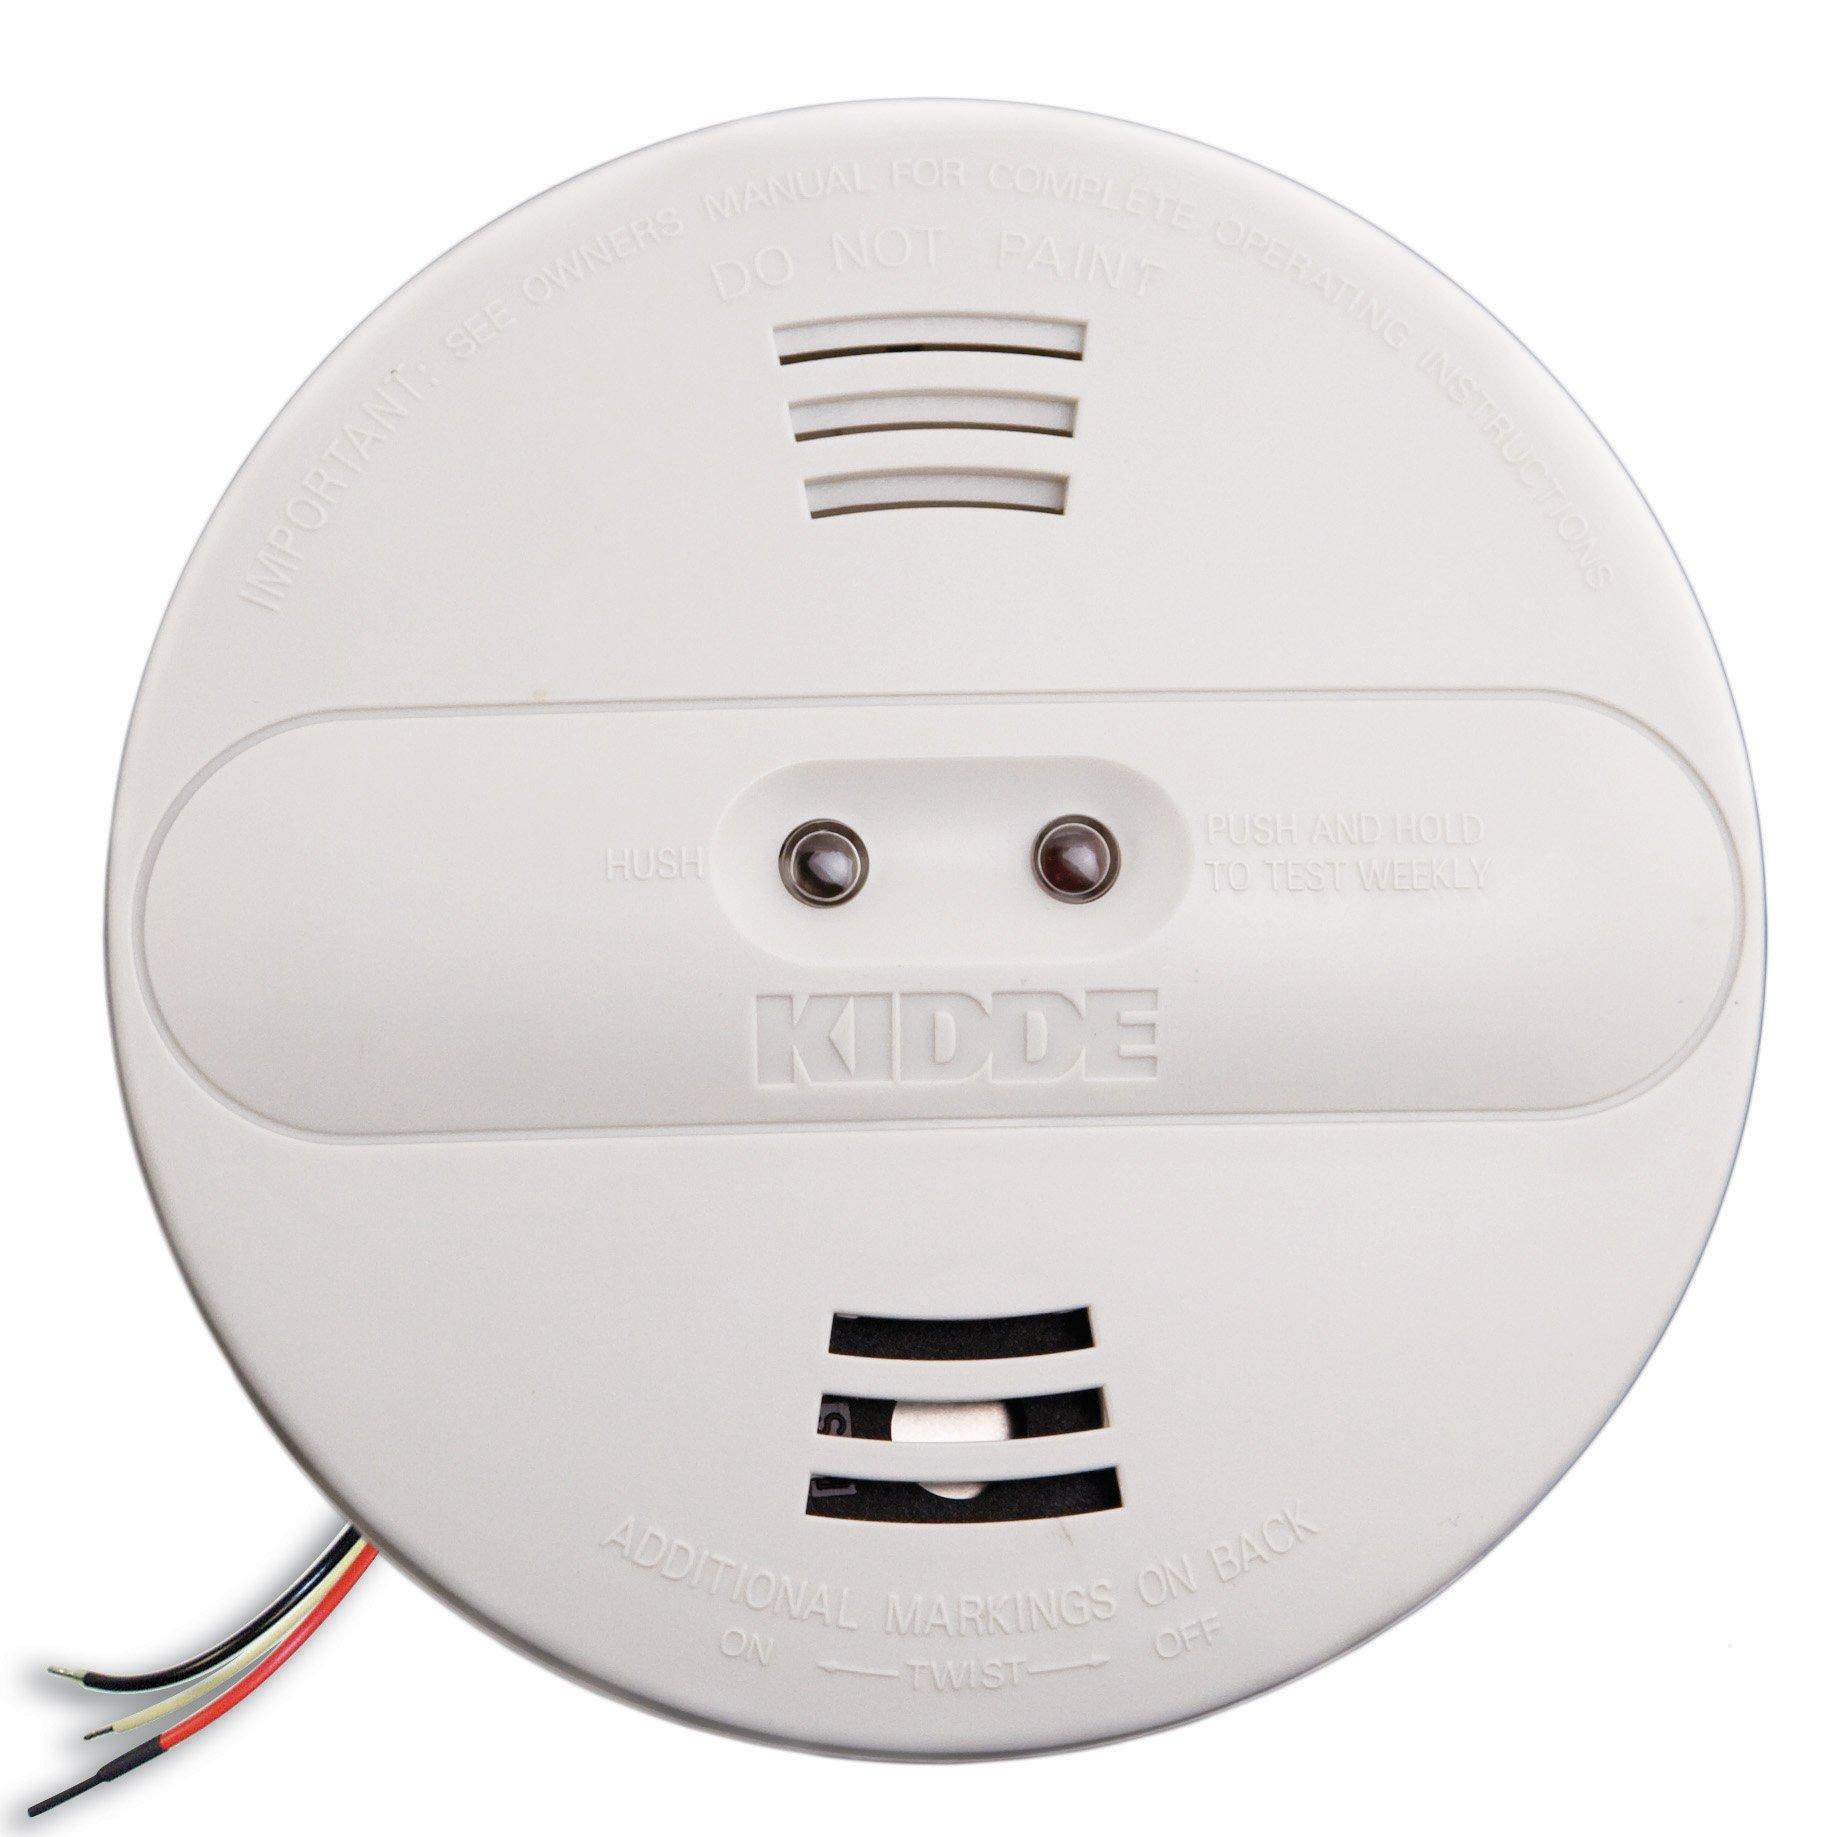 Kidde PI2010 Hardwired Dual Photoelectric and Ionization Sensor Smoke Alarm with Battery Backup by Kidde